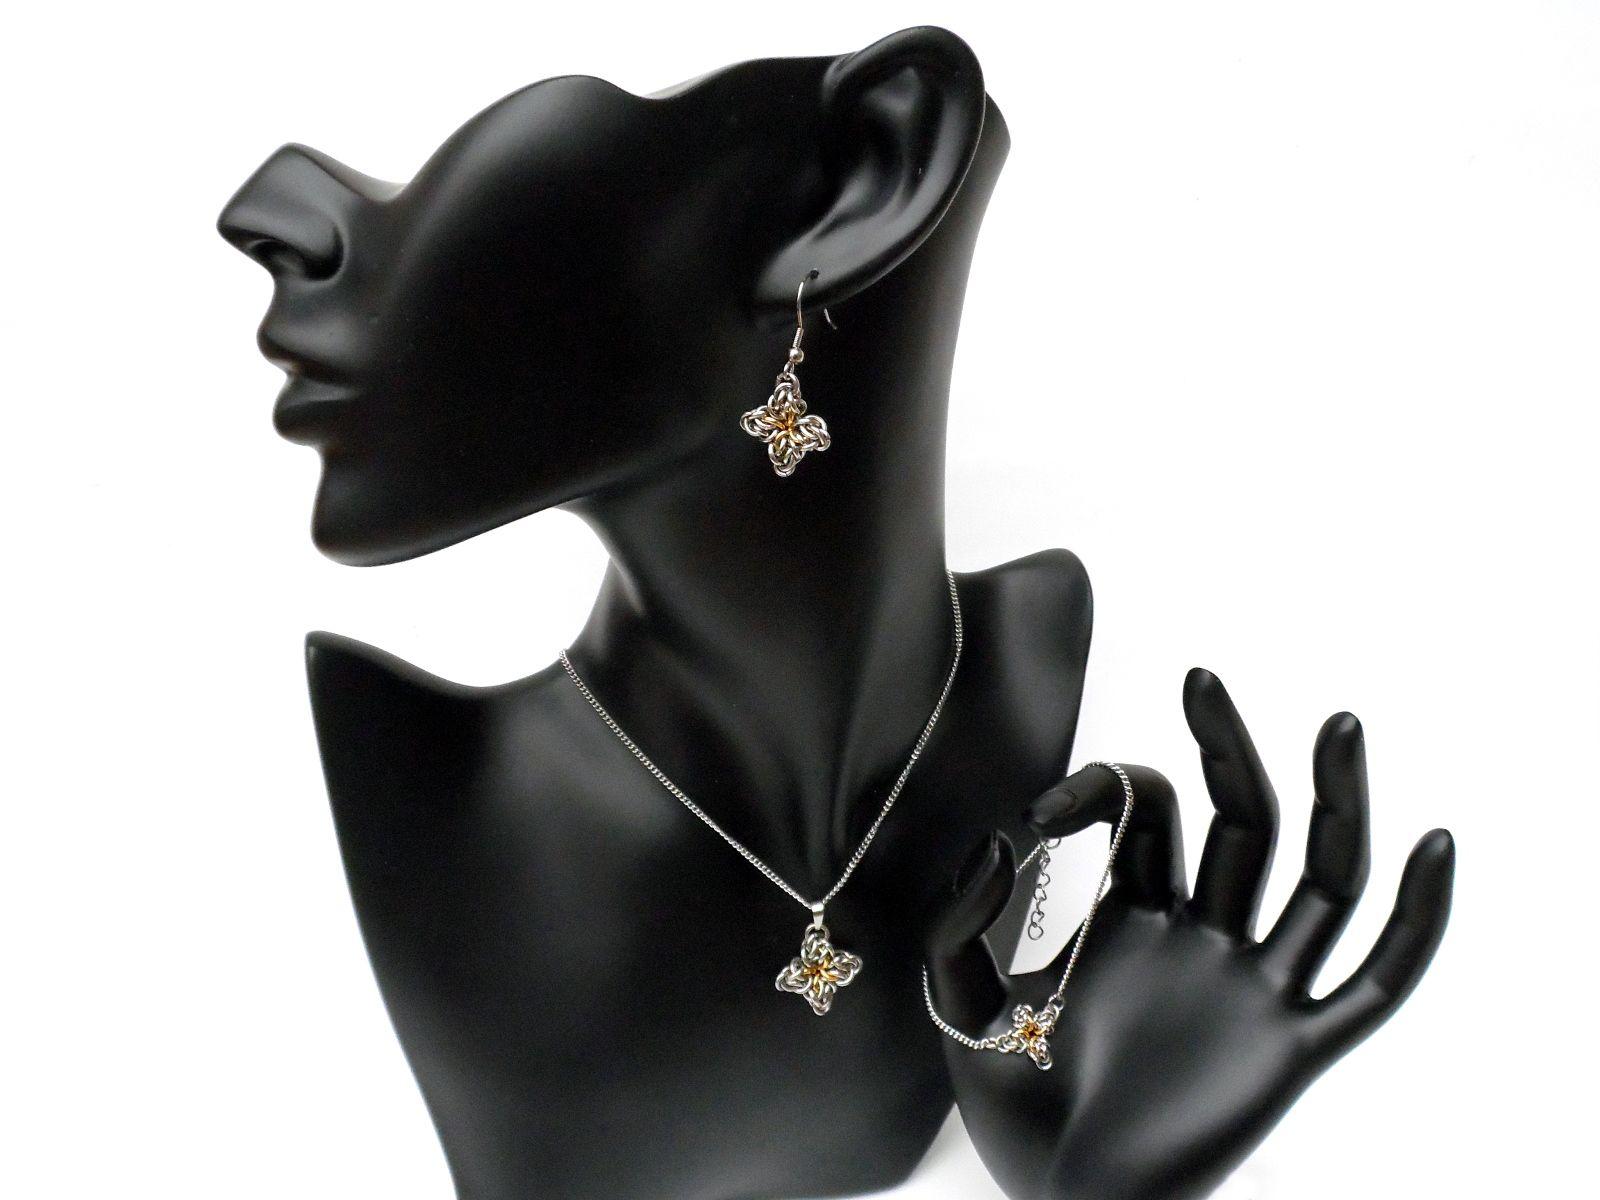 Komplet biżuterii chainmaille ze stali chirurgicznej